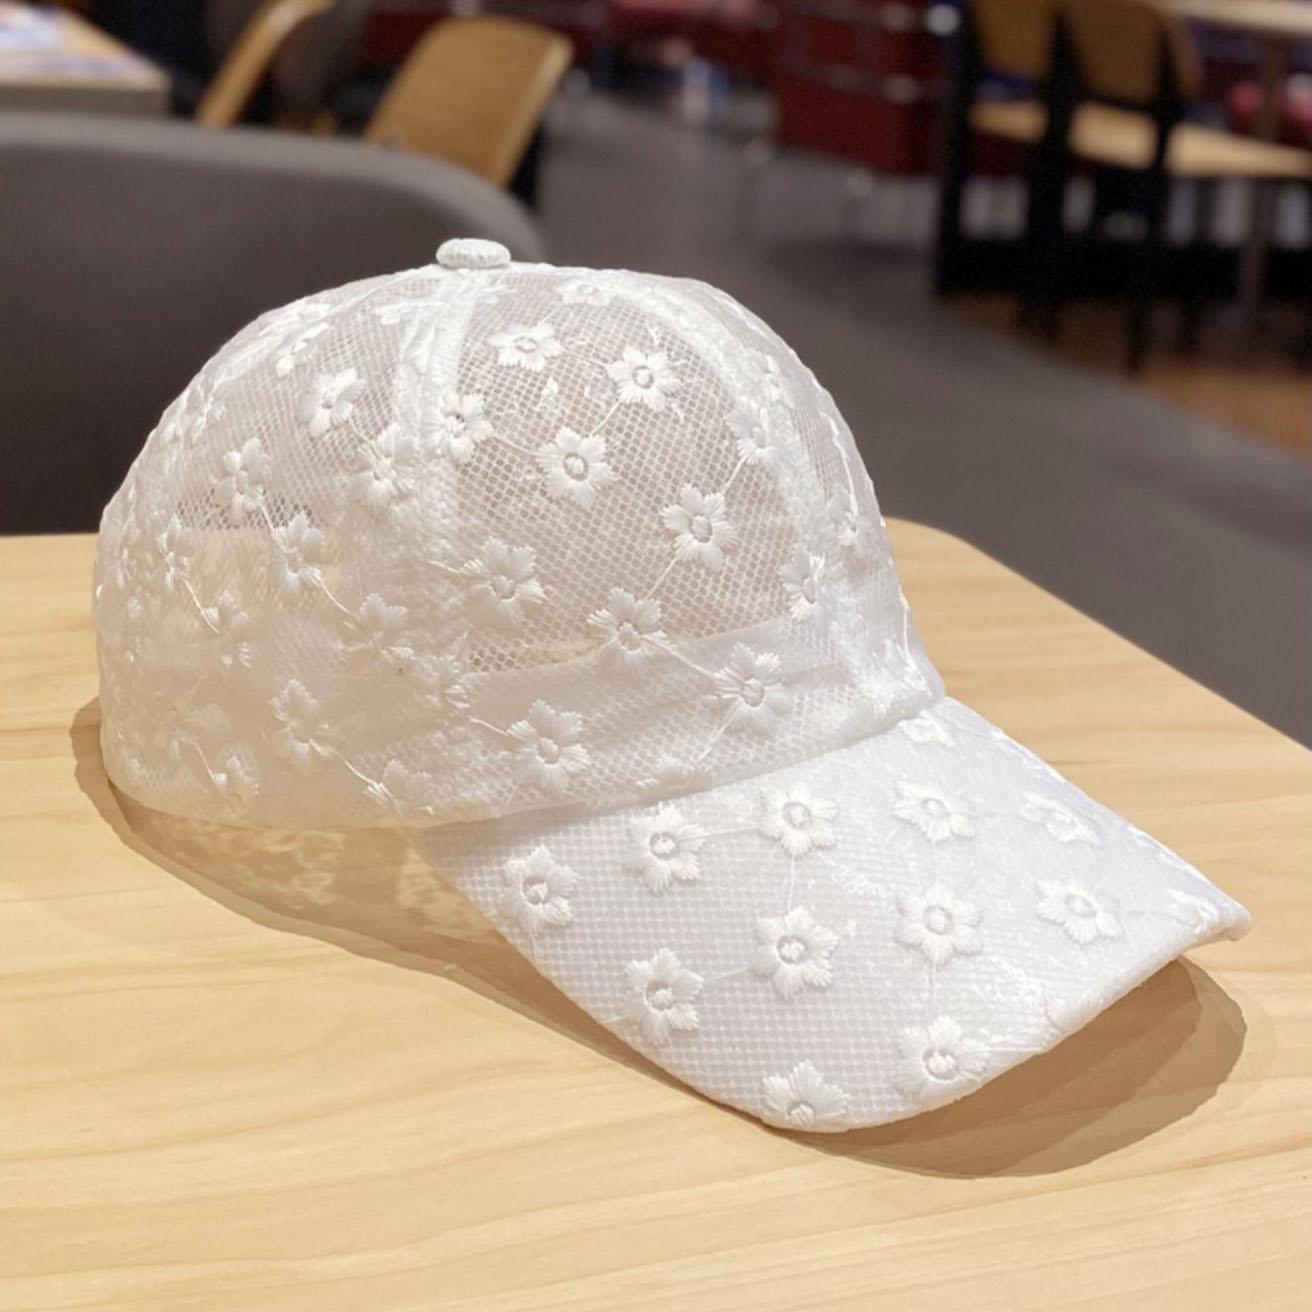 New female summer lace flower baseball cap fashion versatile sunshade breathable cap